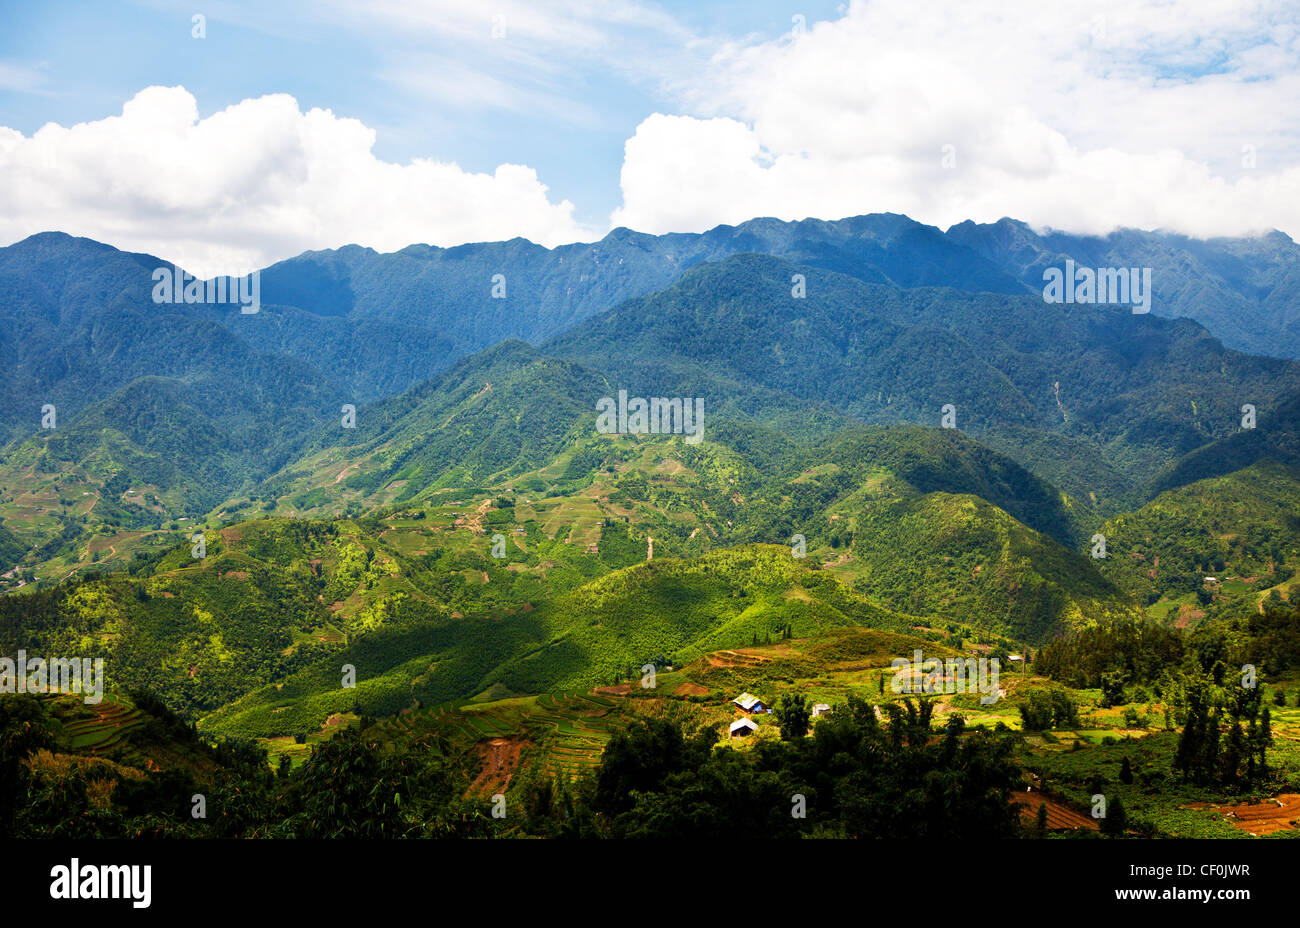 Hoang Lien Son mountain range in Sapa, Vietnam - Stock Image